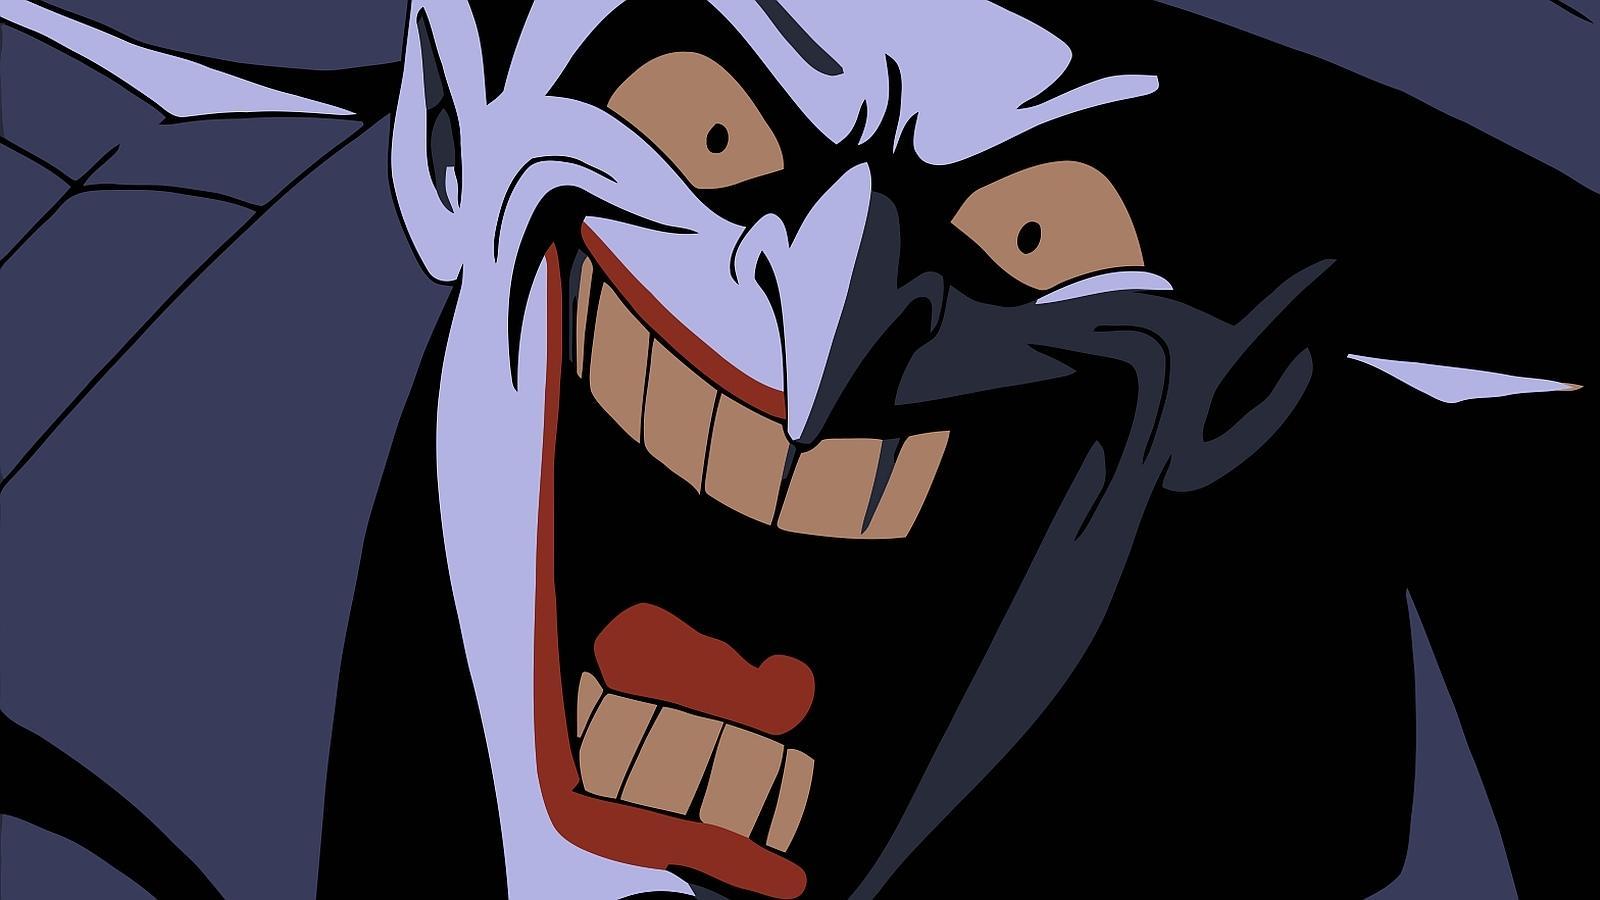 Batman The Animated Series Wallpaper Hd Download